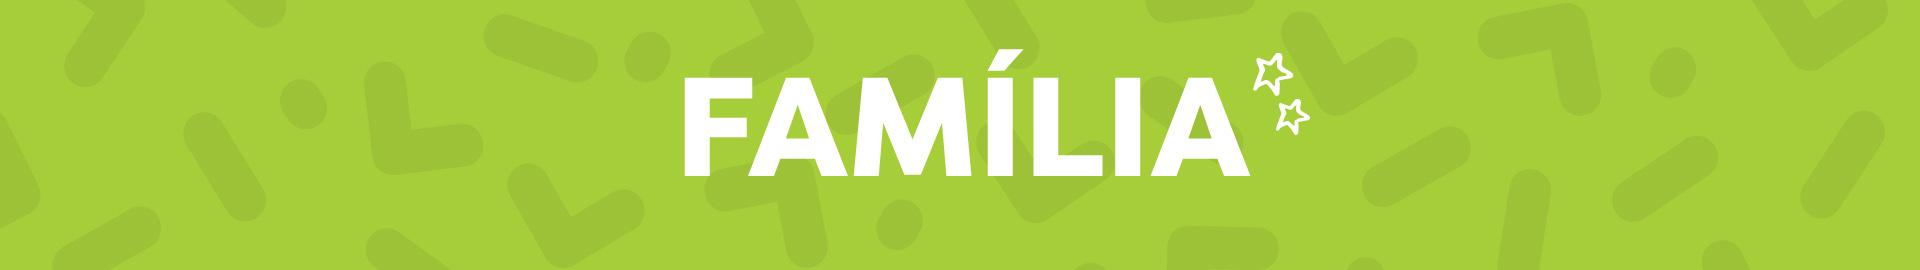 fAMILIA 01